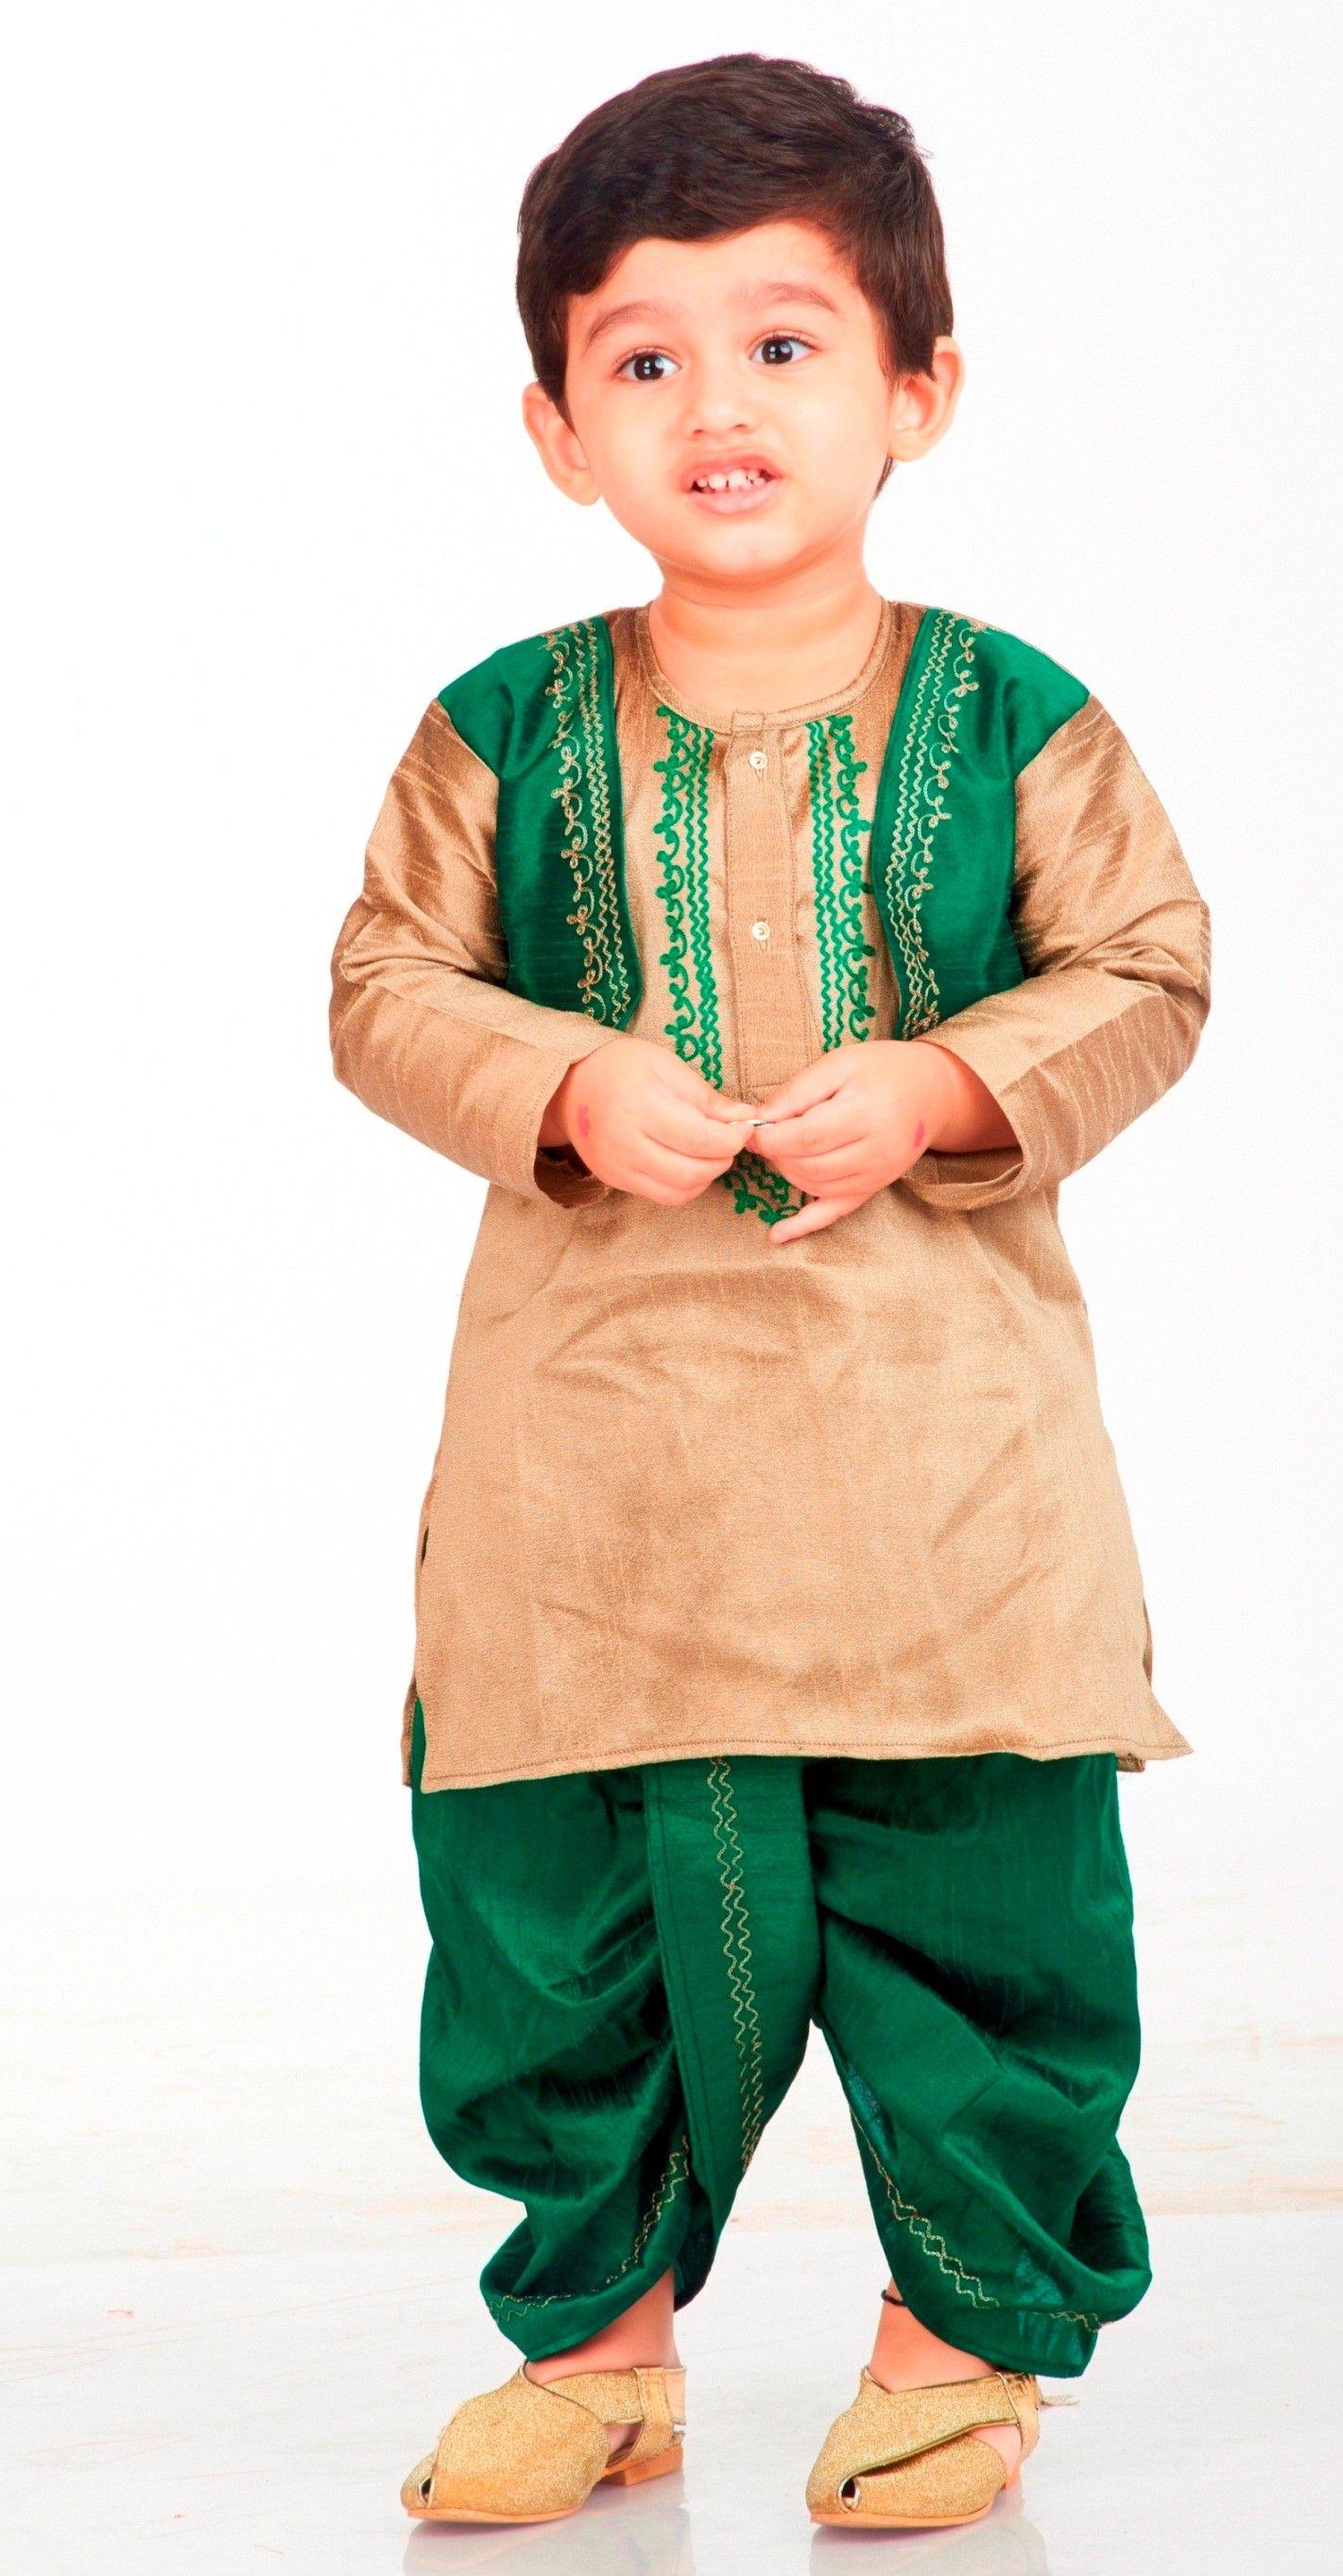 d2d4c3d99f68 Pin by shruti singla on Indian baby dress